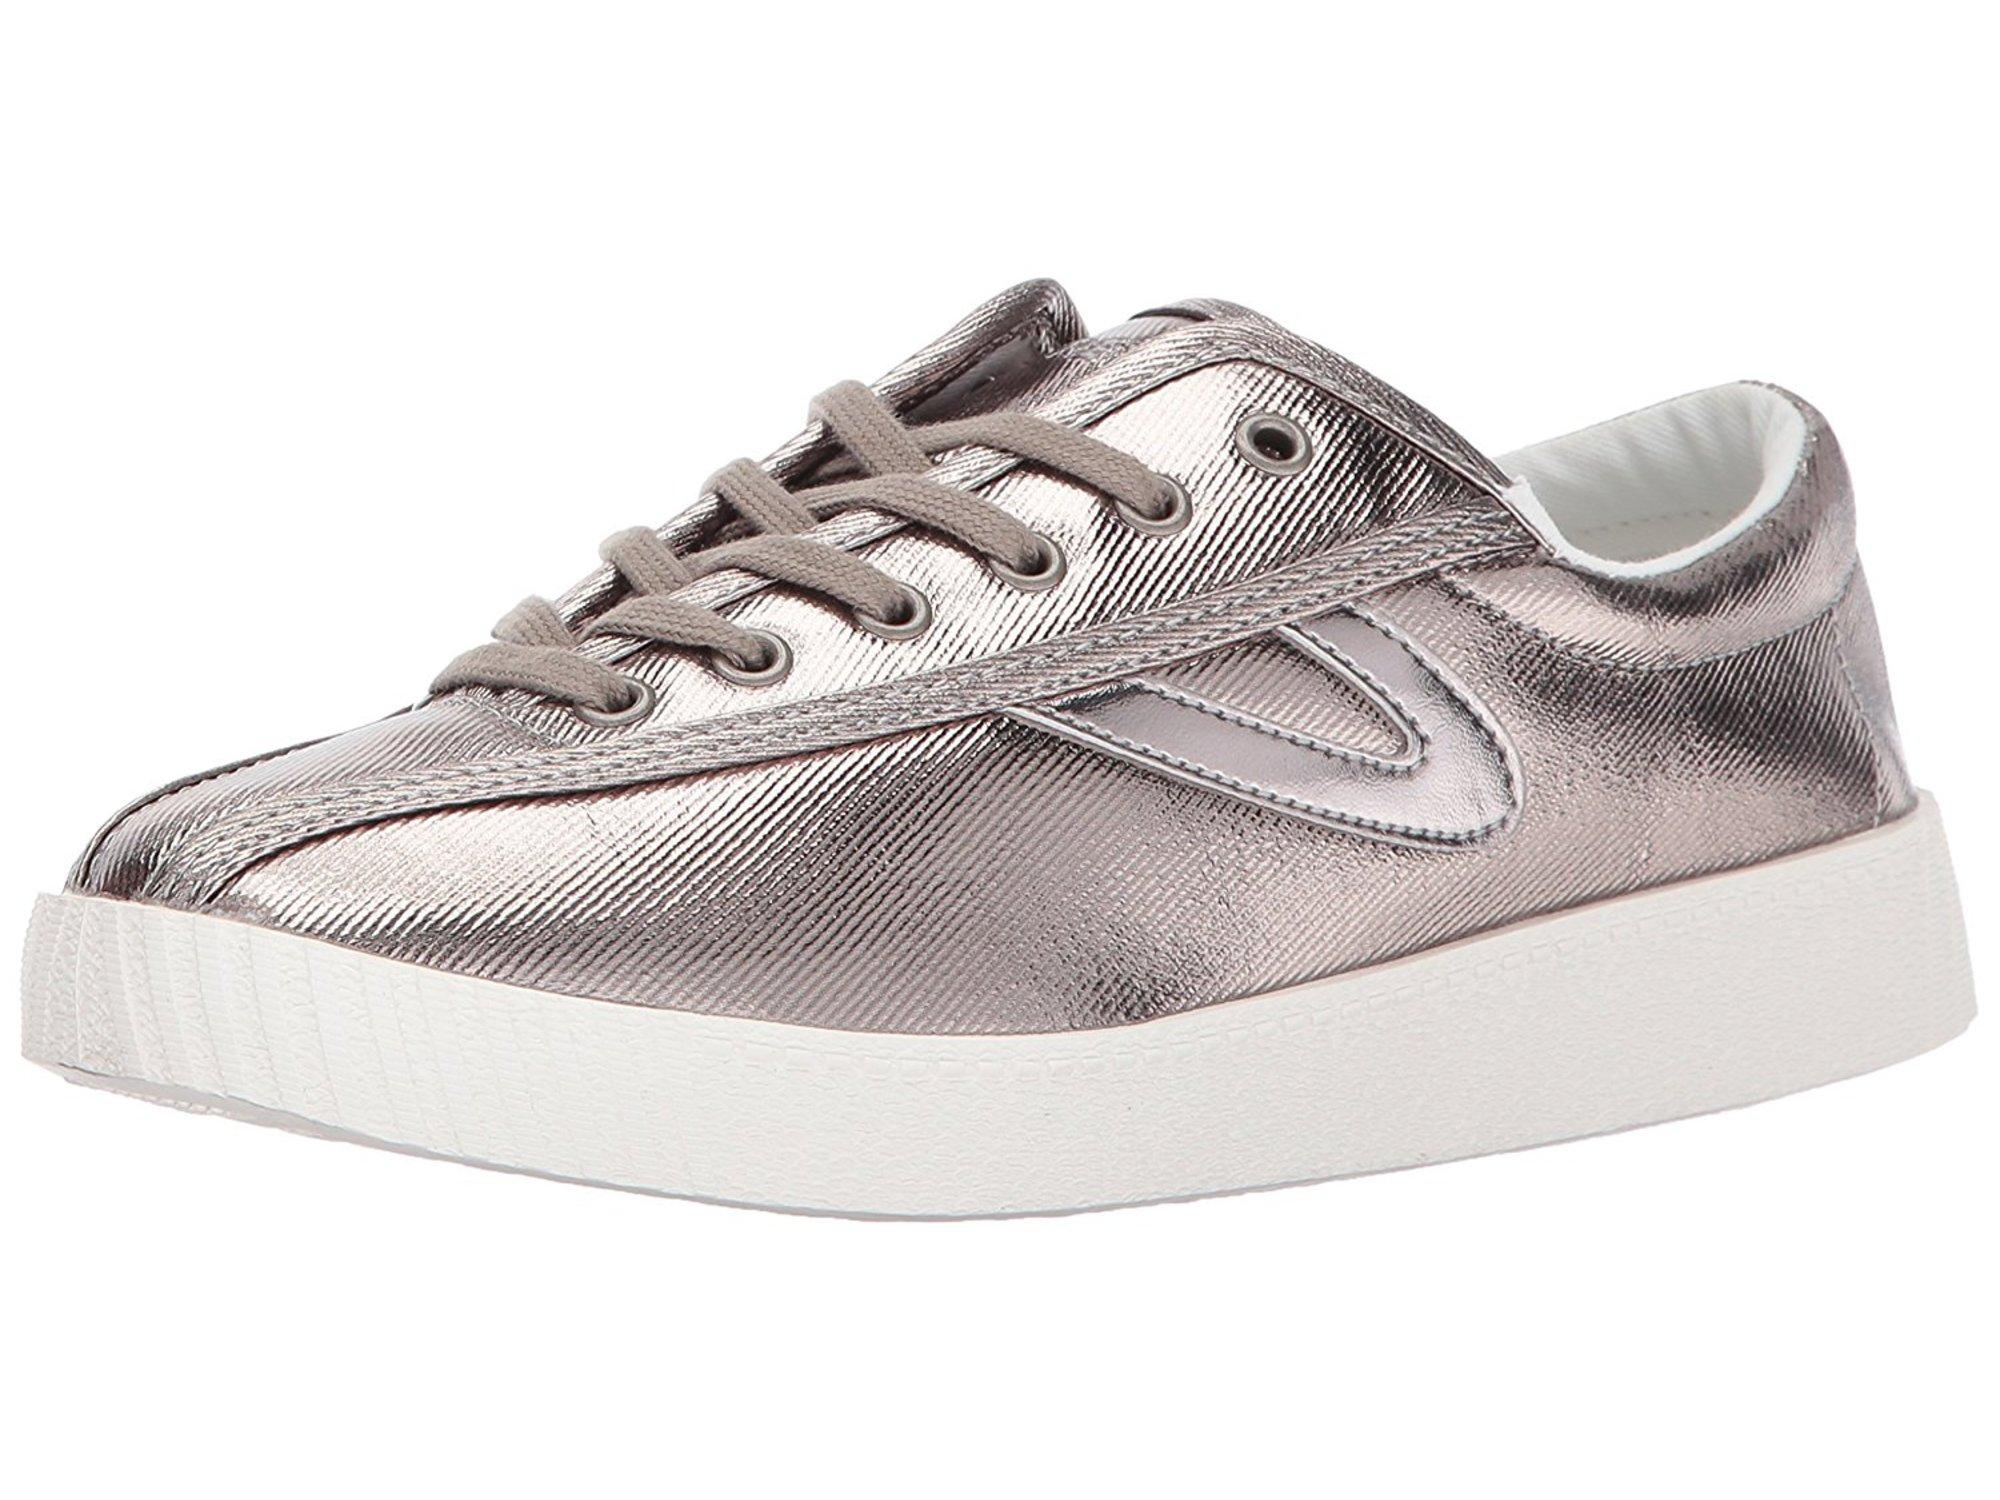 Tretorn Women's Nyliteplus Sneaker by Tretorn